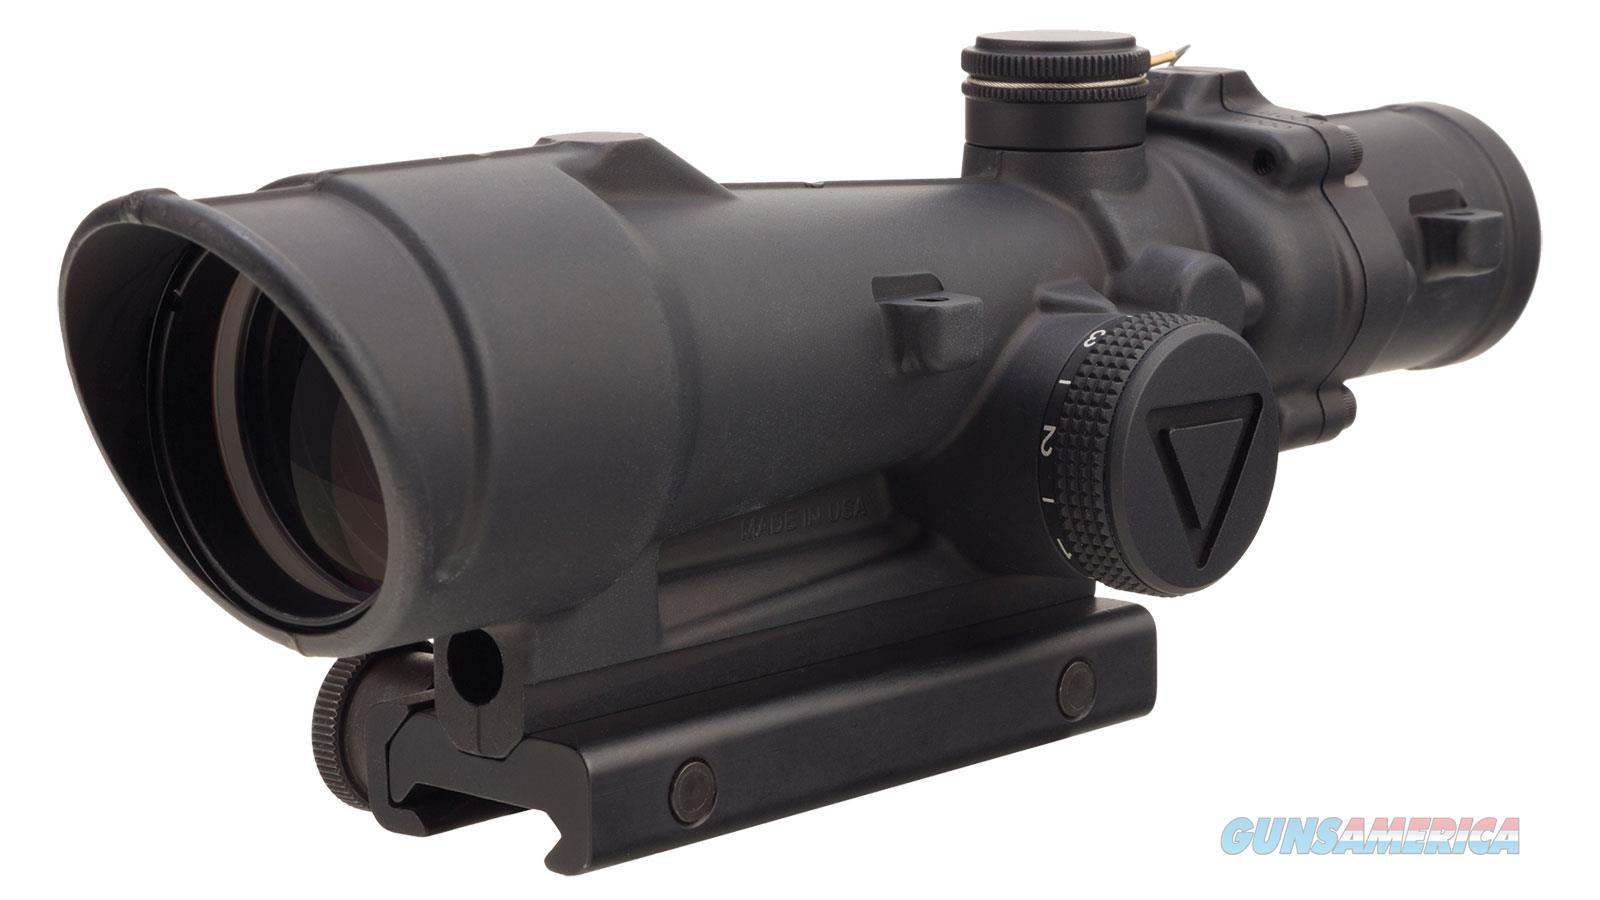 Trijicon Acog  3.5X35 Red Led Ill TA110-C-100497  Non-Guns > Iron/Metal/Peep Sights